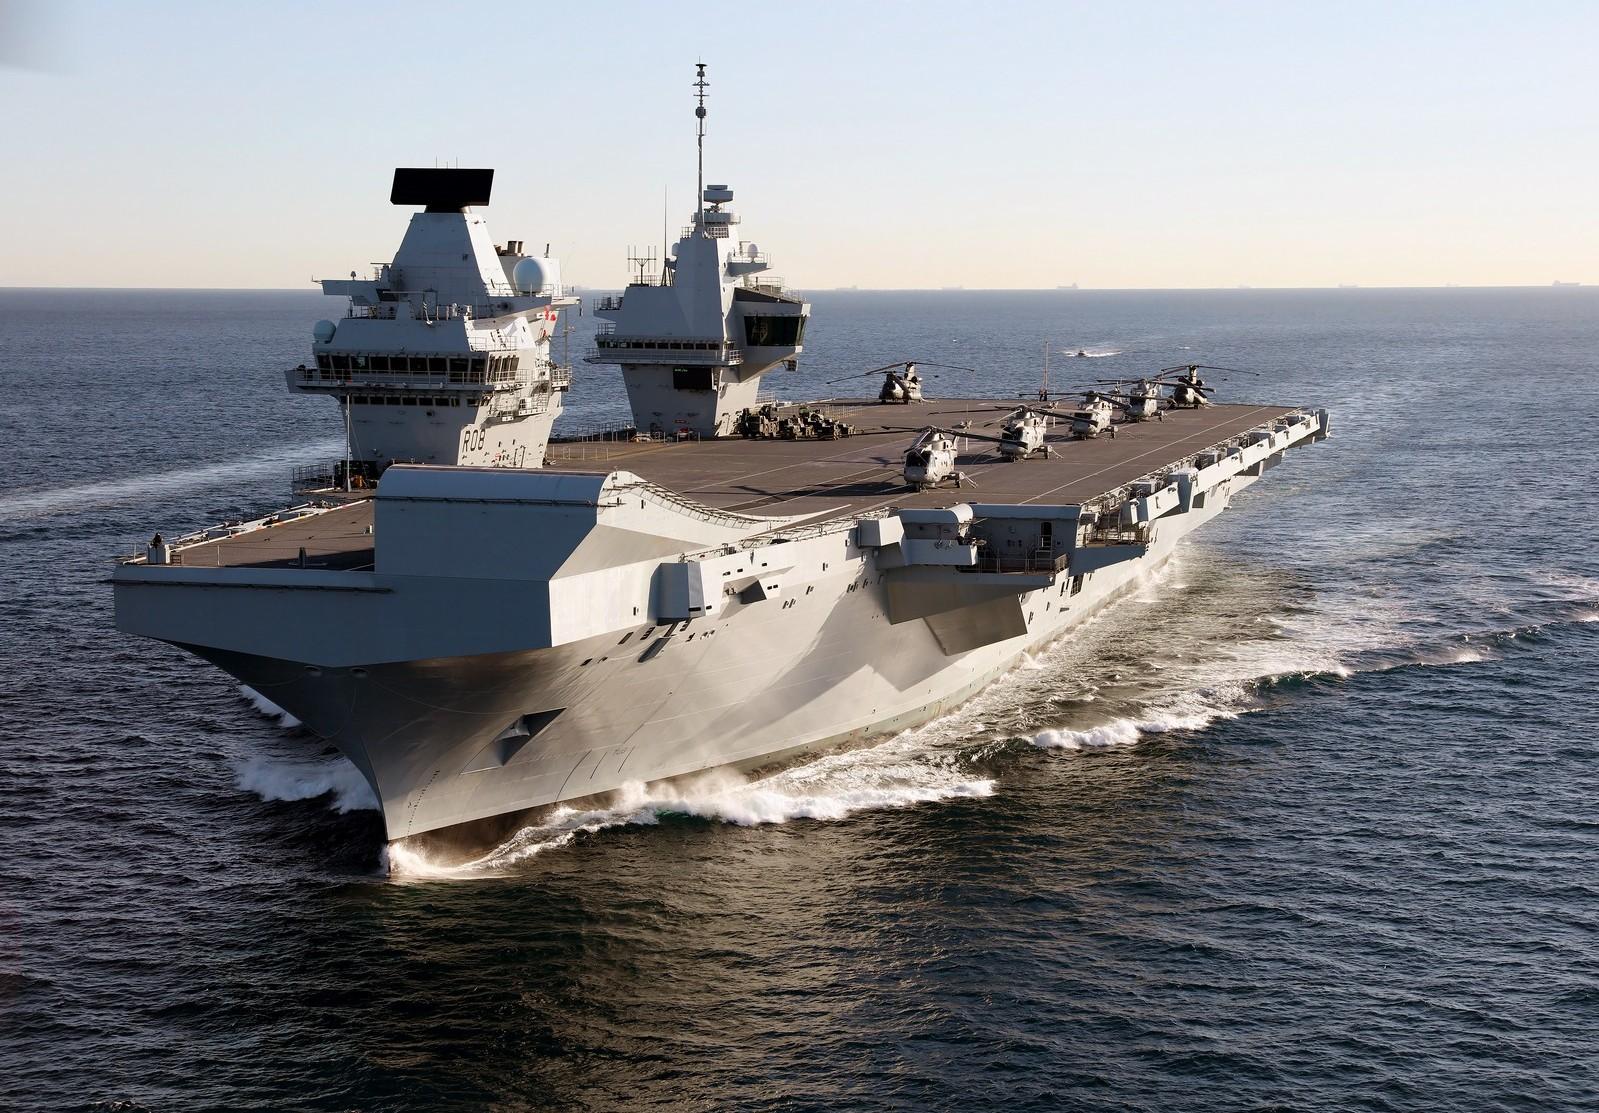 File:HMS Queen Elizabeth in Gibraltar - 2018 (28386226189).jpg - Wikimedia Commons